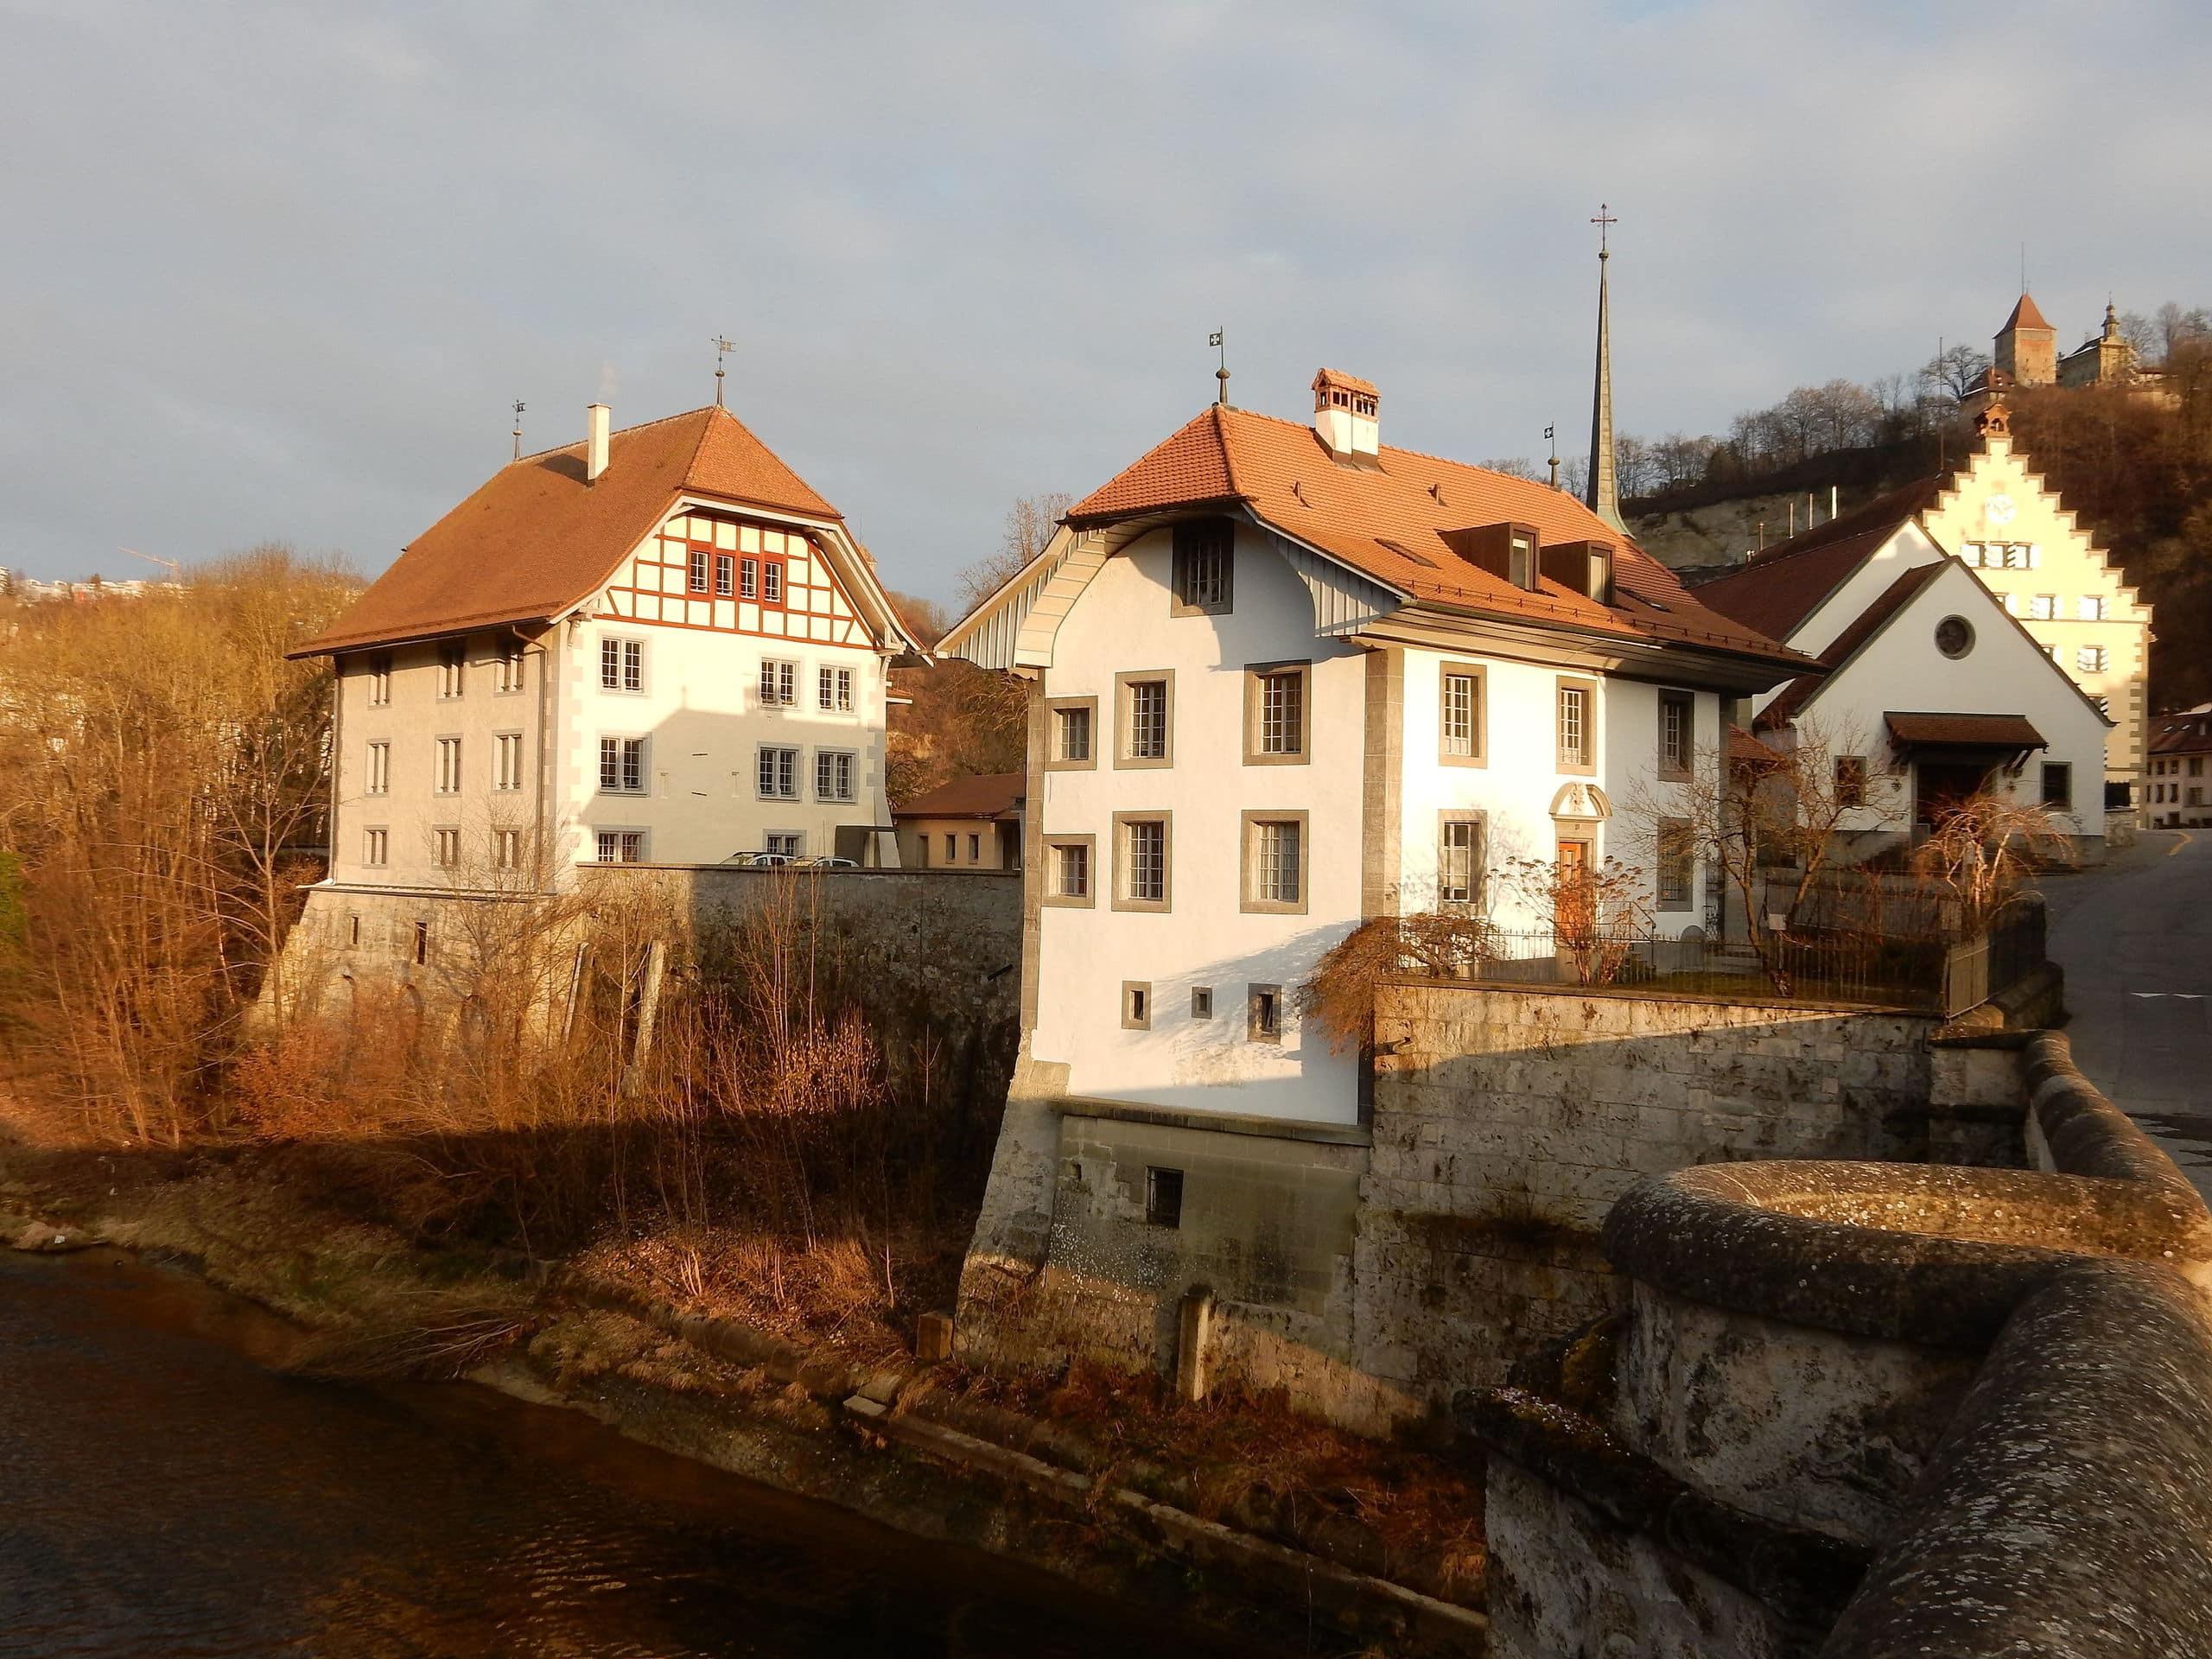 Komturei St. Johann in Freiburg